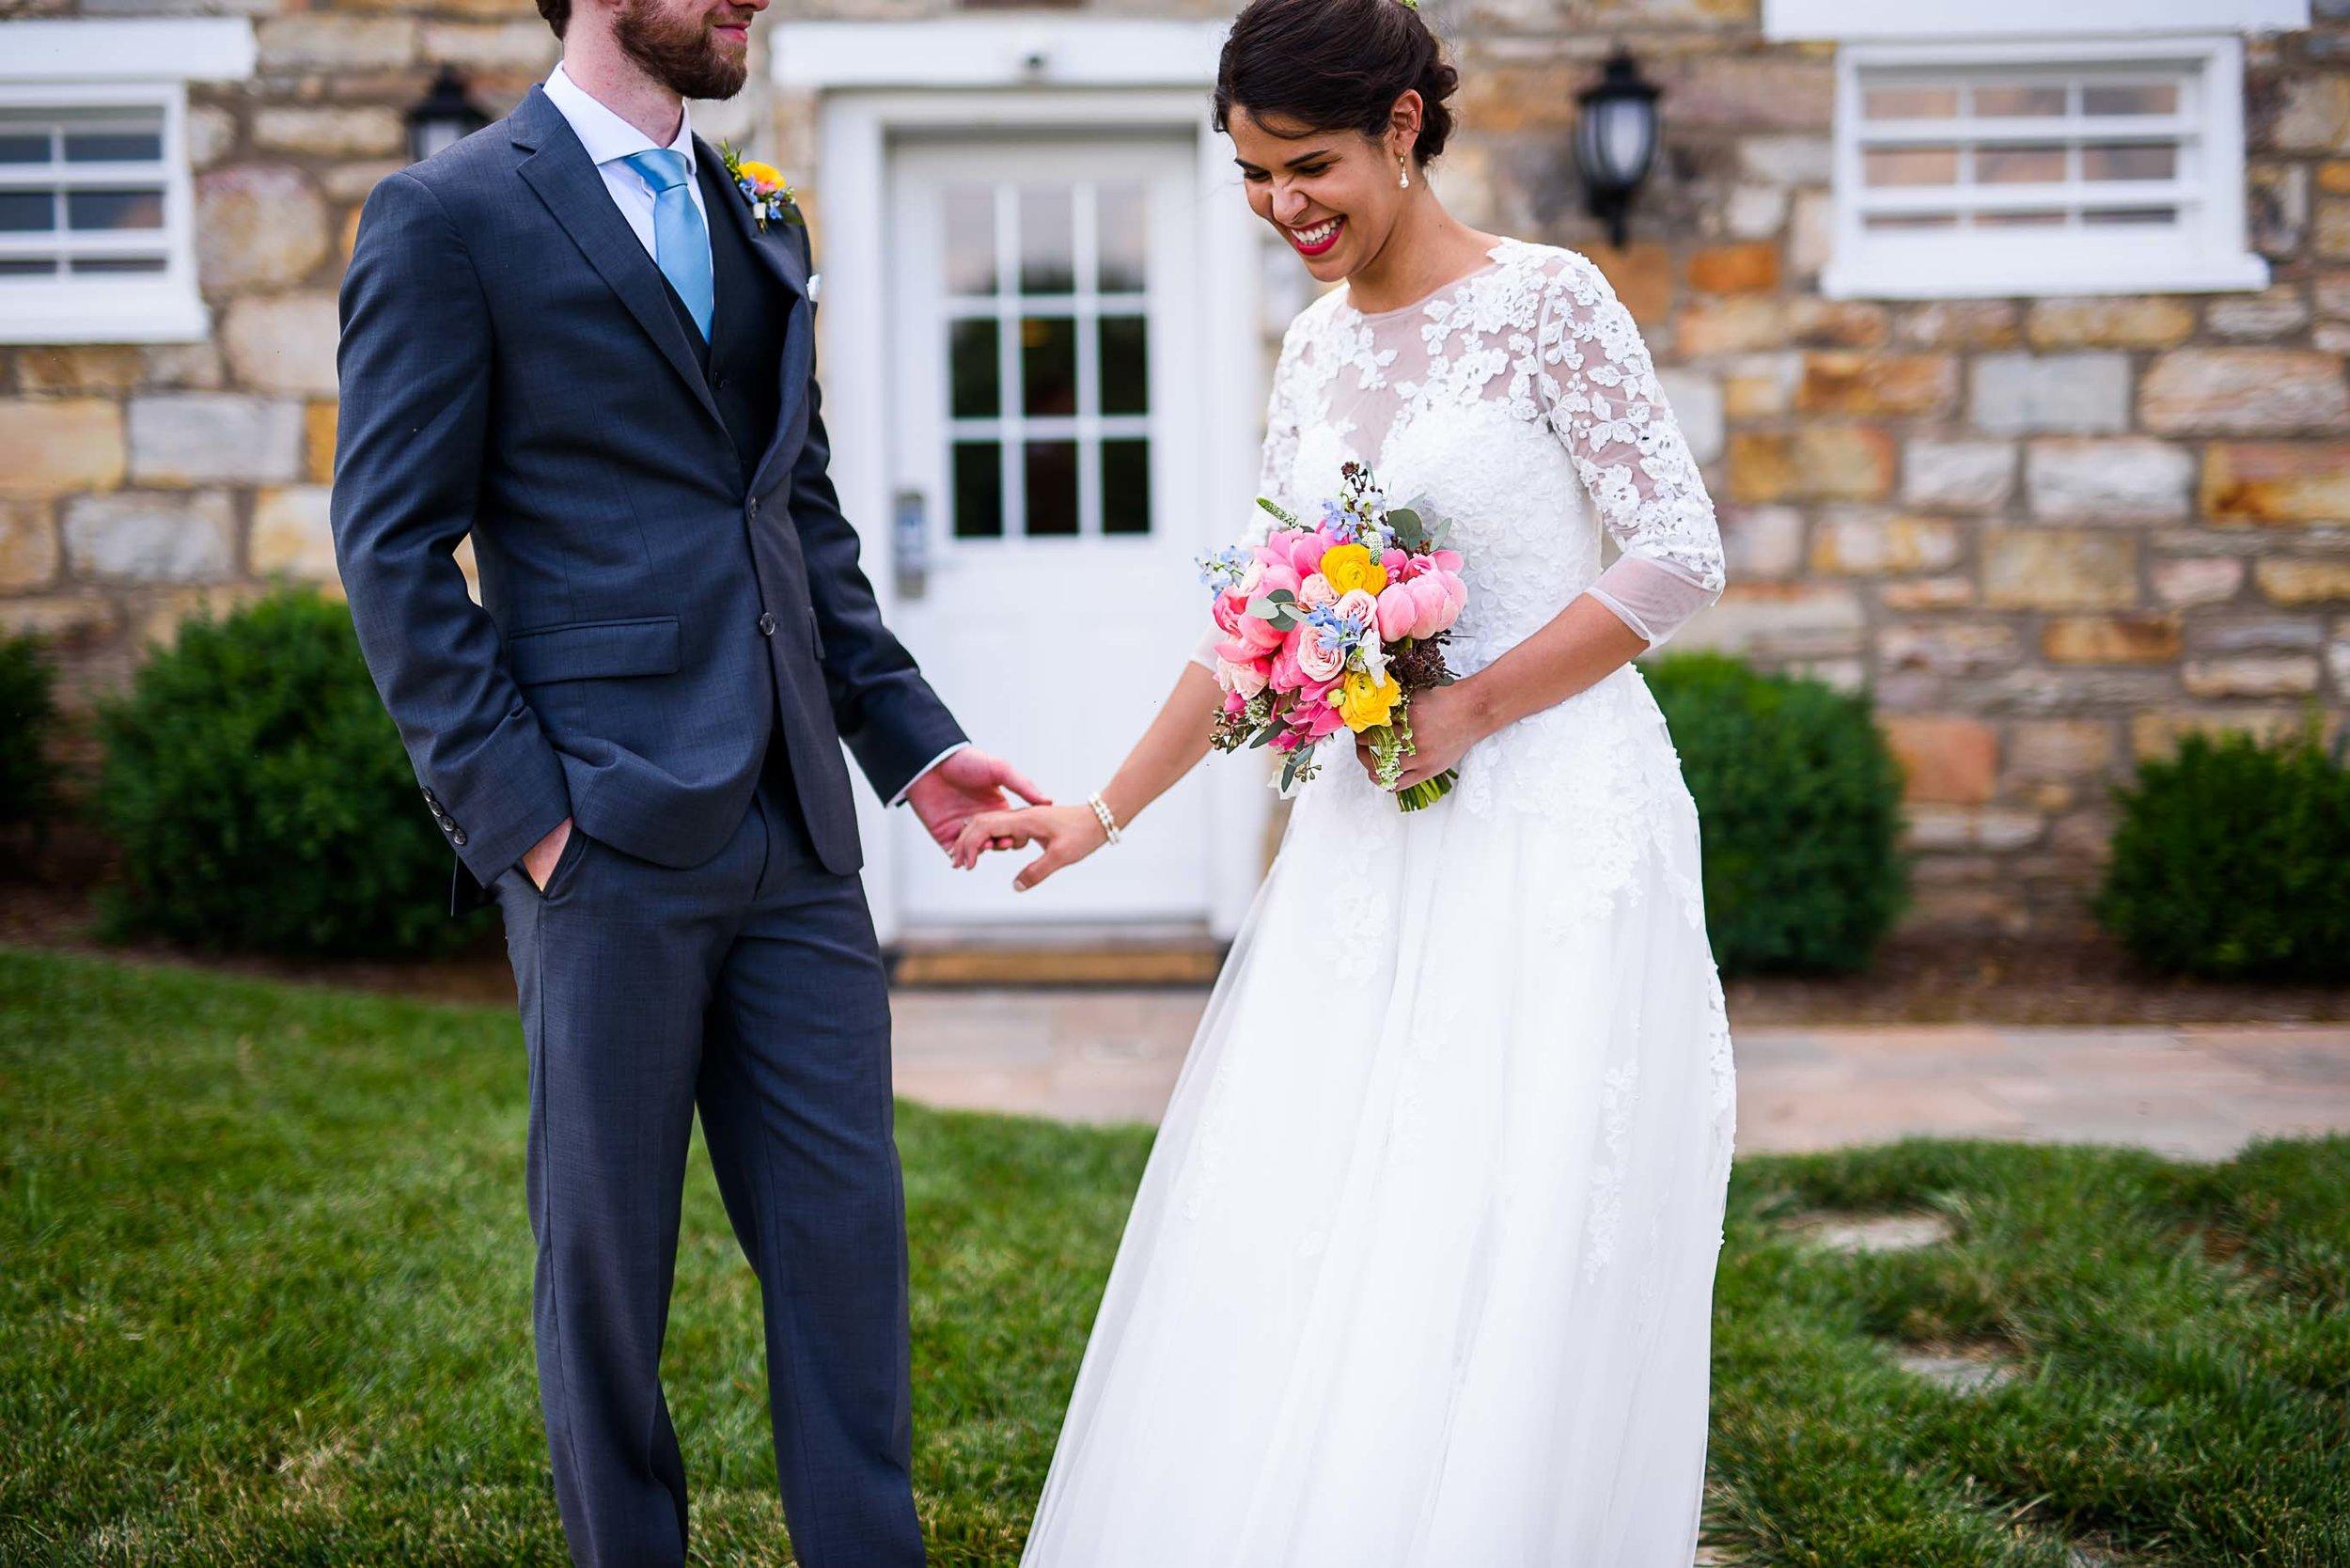 Evergreen Country Club wedding photos59.jpg